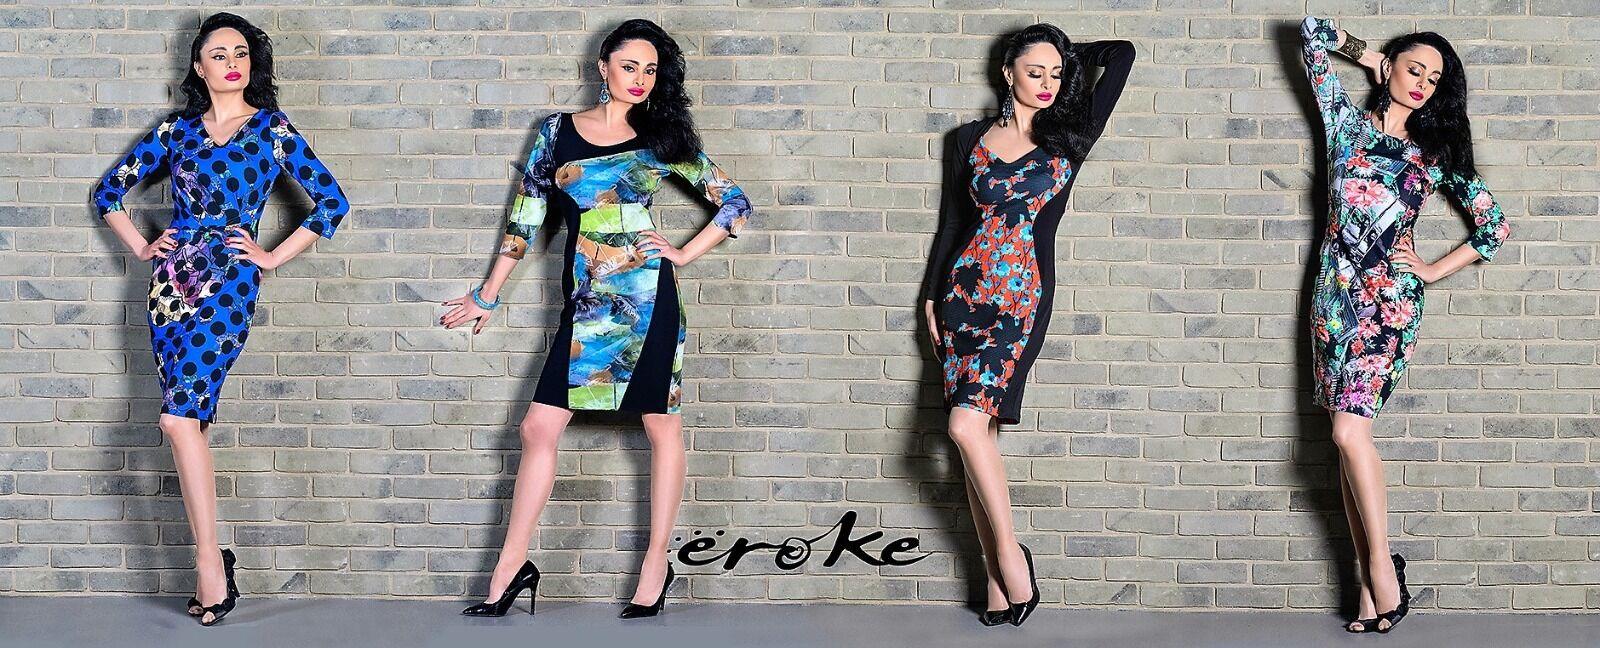 Eroke Lookbook 2016